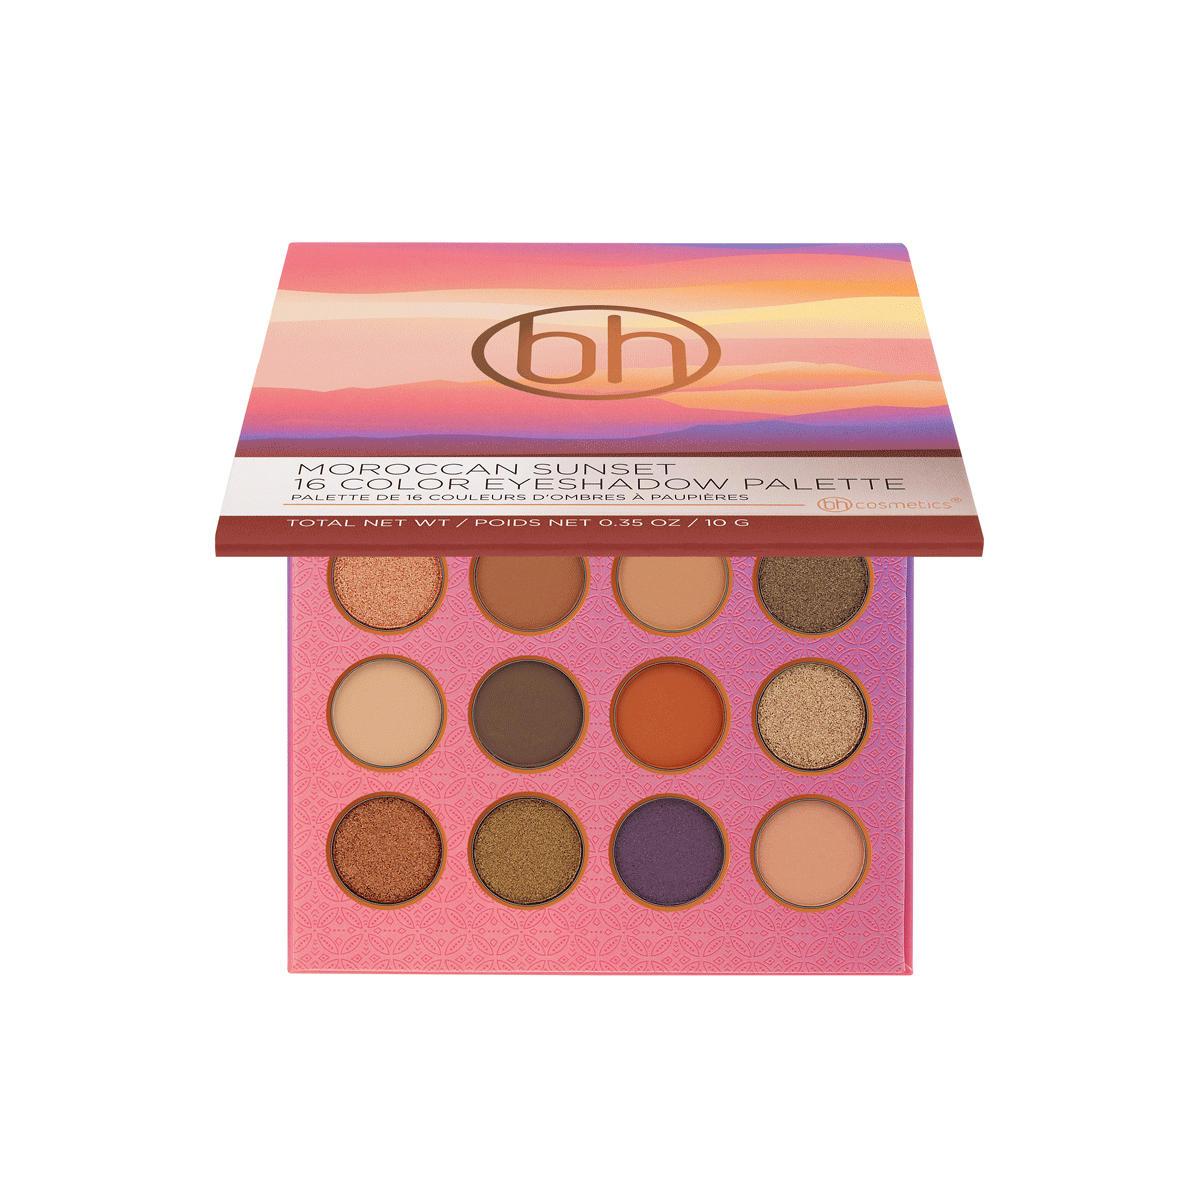 BH Cosmetics Moroccan Sunset Eyeshadow Palette